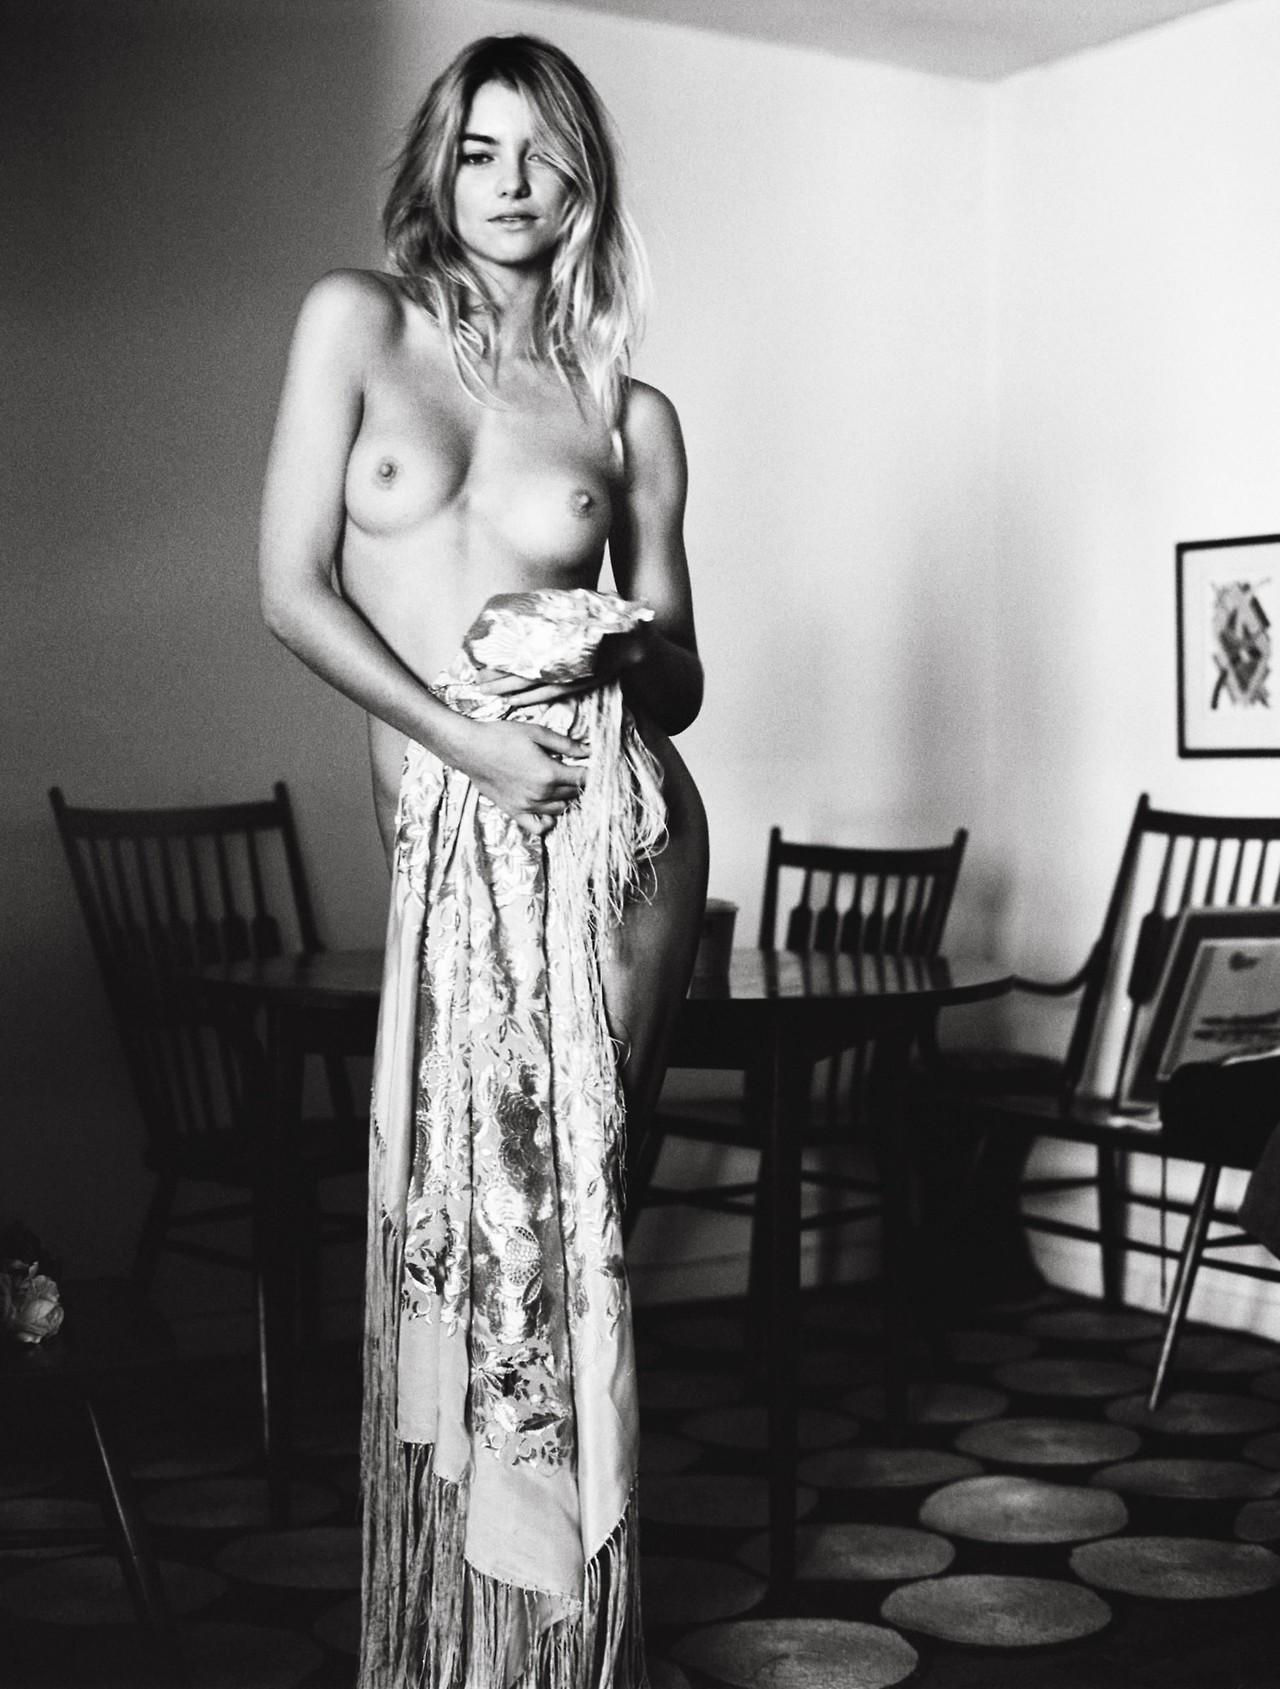 Elyse nude — pic 9